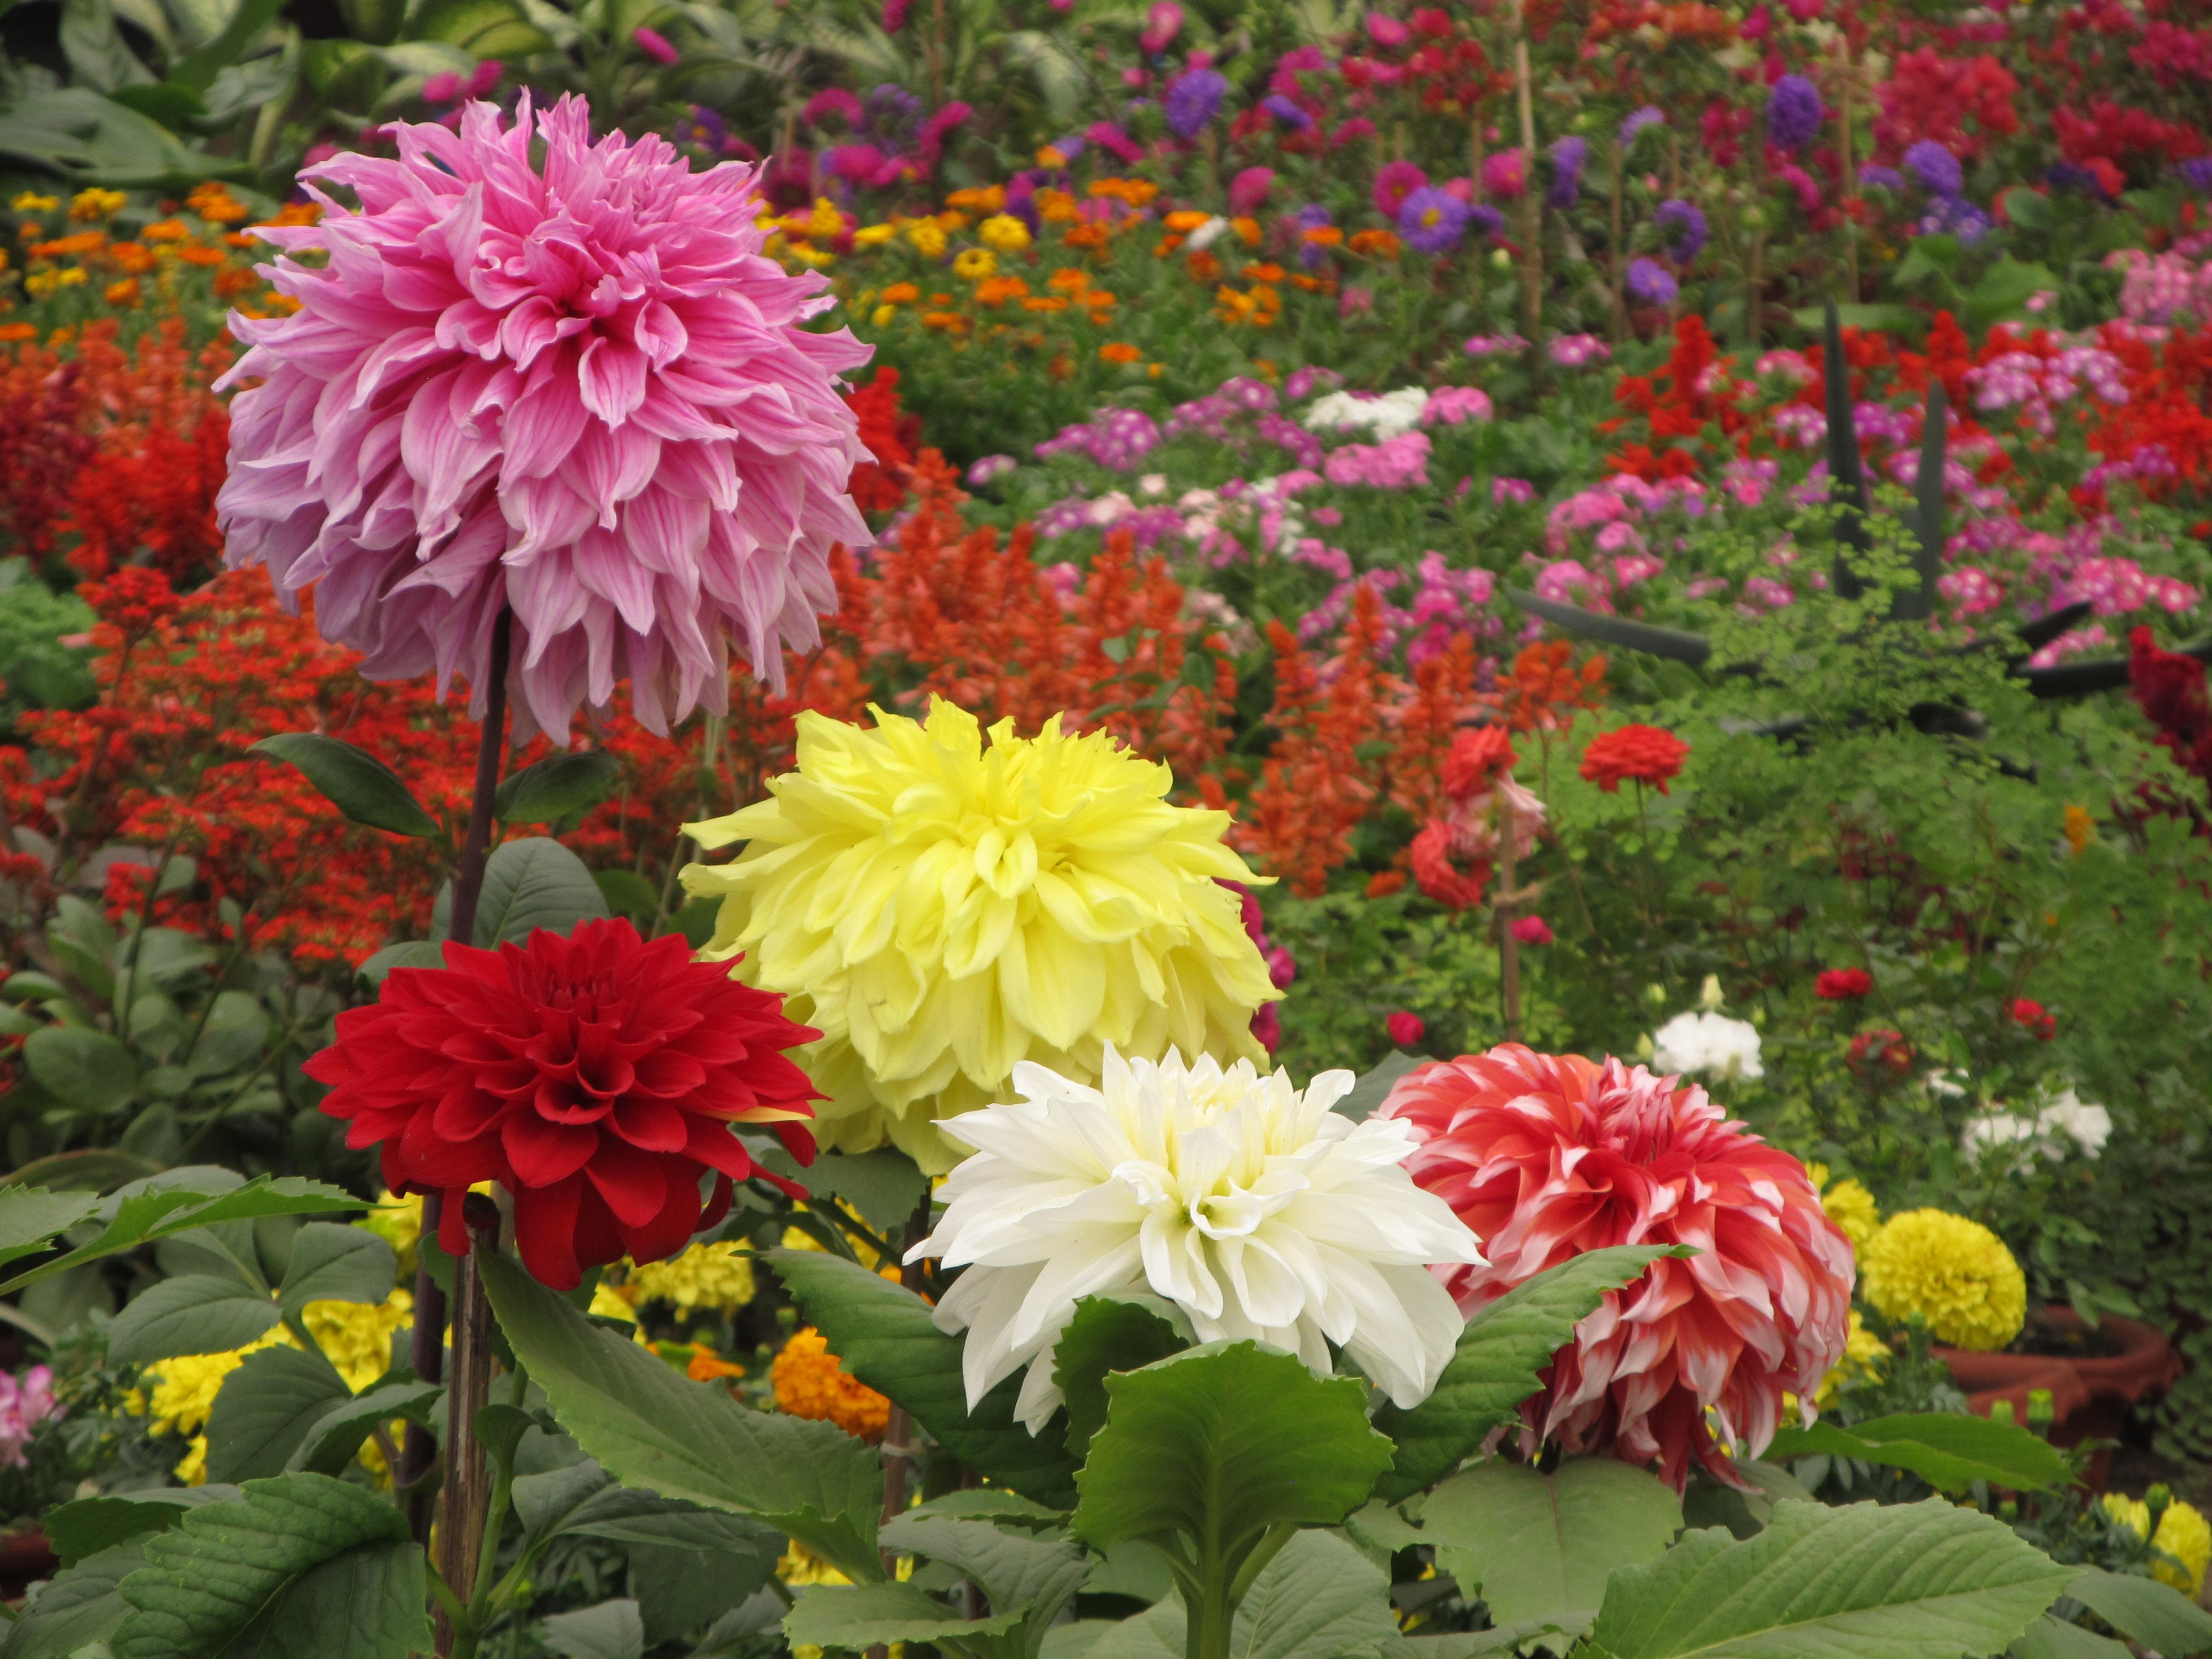 In The Dahlia Garden By Ann Kendall. U201c